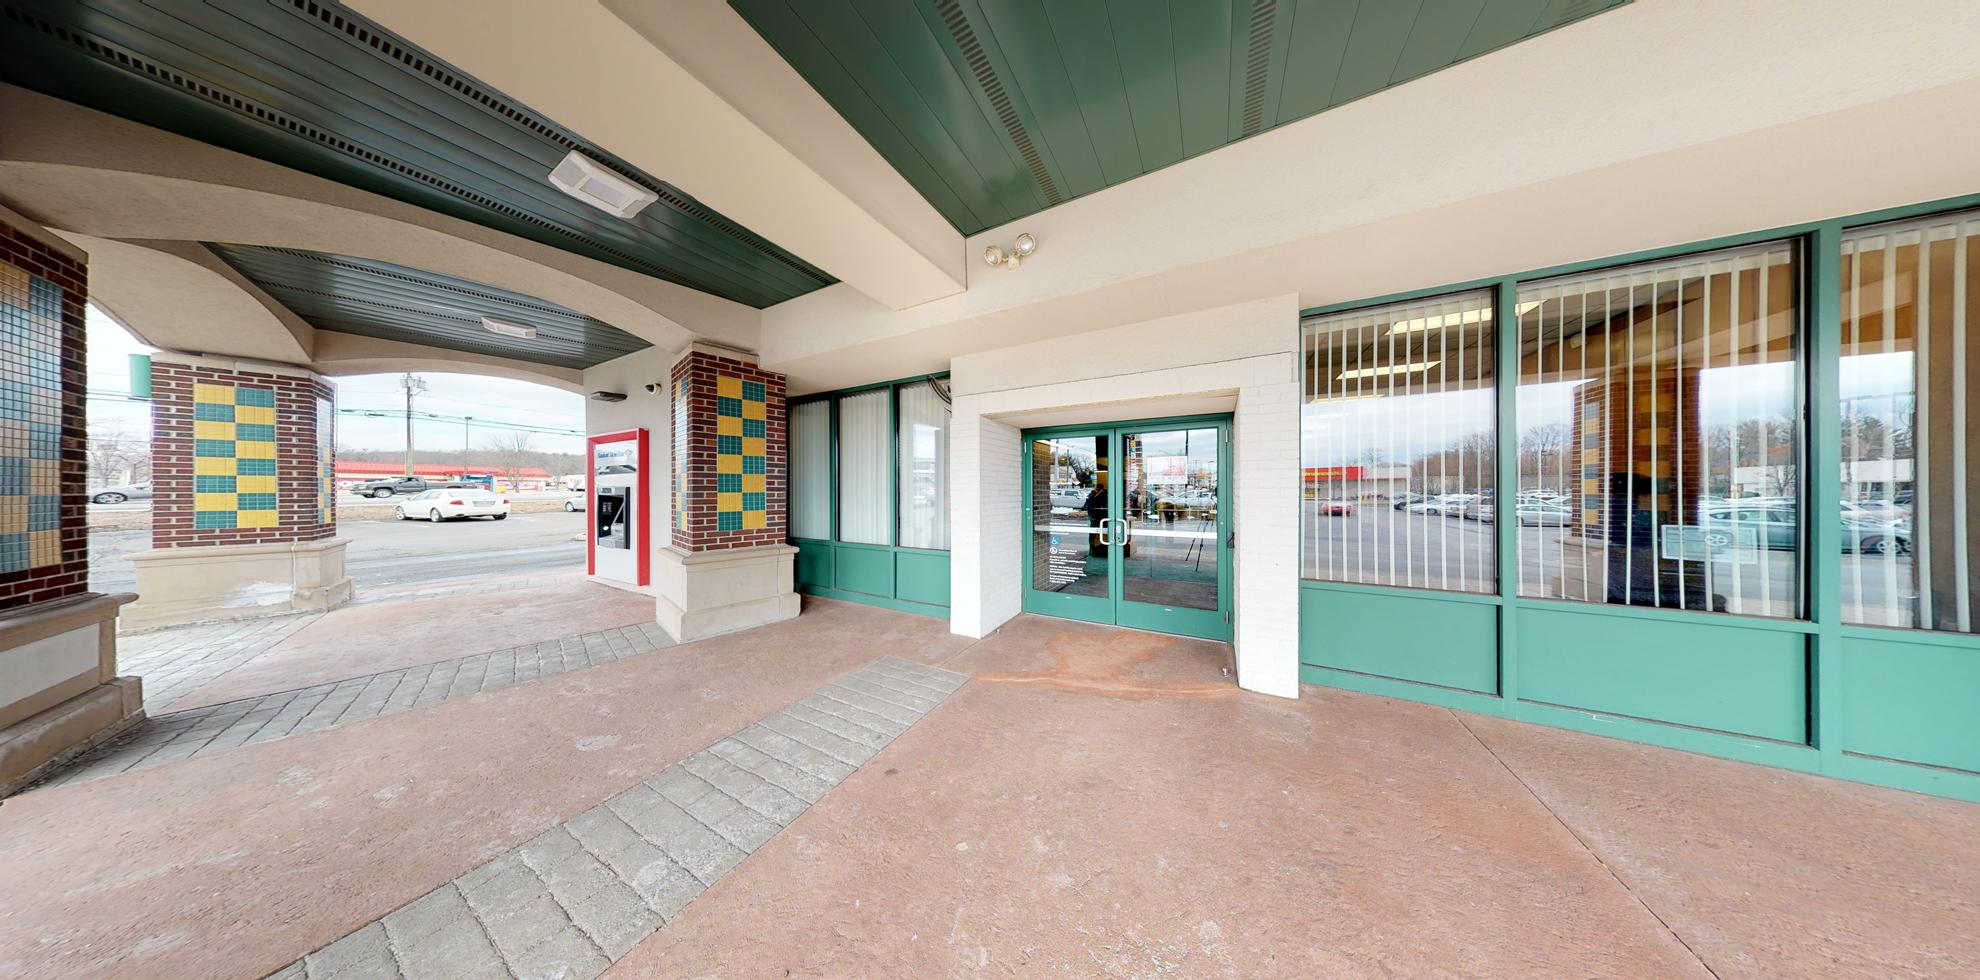 Bank of America financial center with drive-thru ATM | 1232 Farmington Ave, Bristol, CT 06010